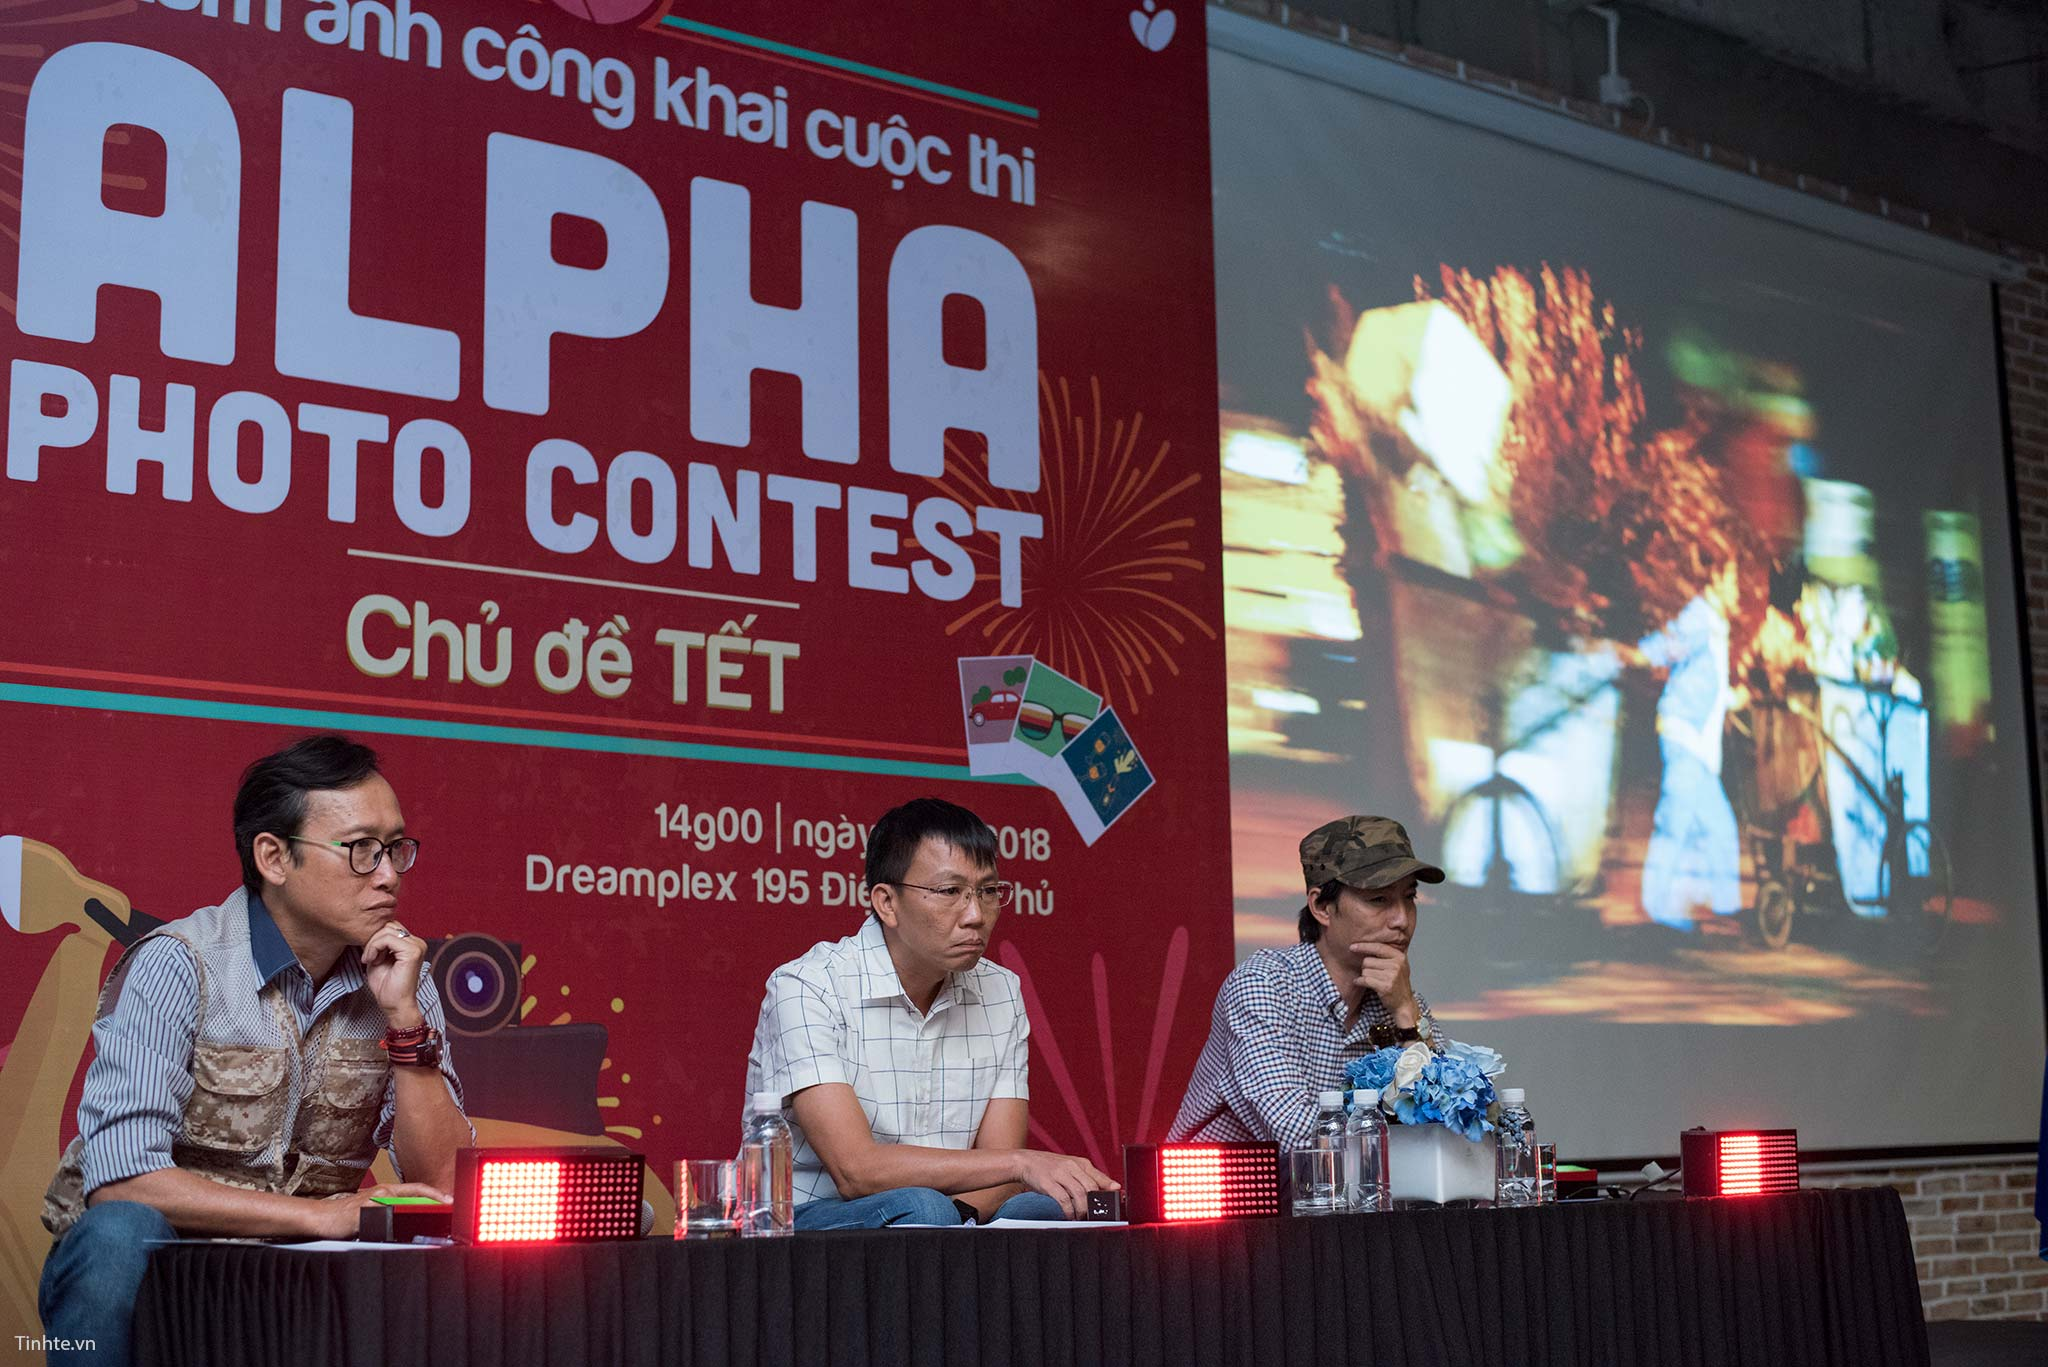 alphaphotocontest-camera.tinhte.vn-50.jpg